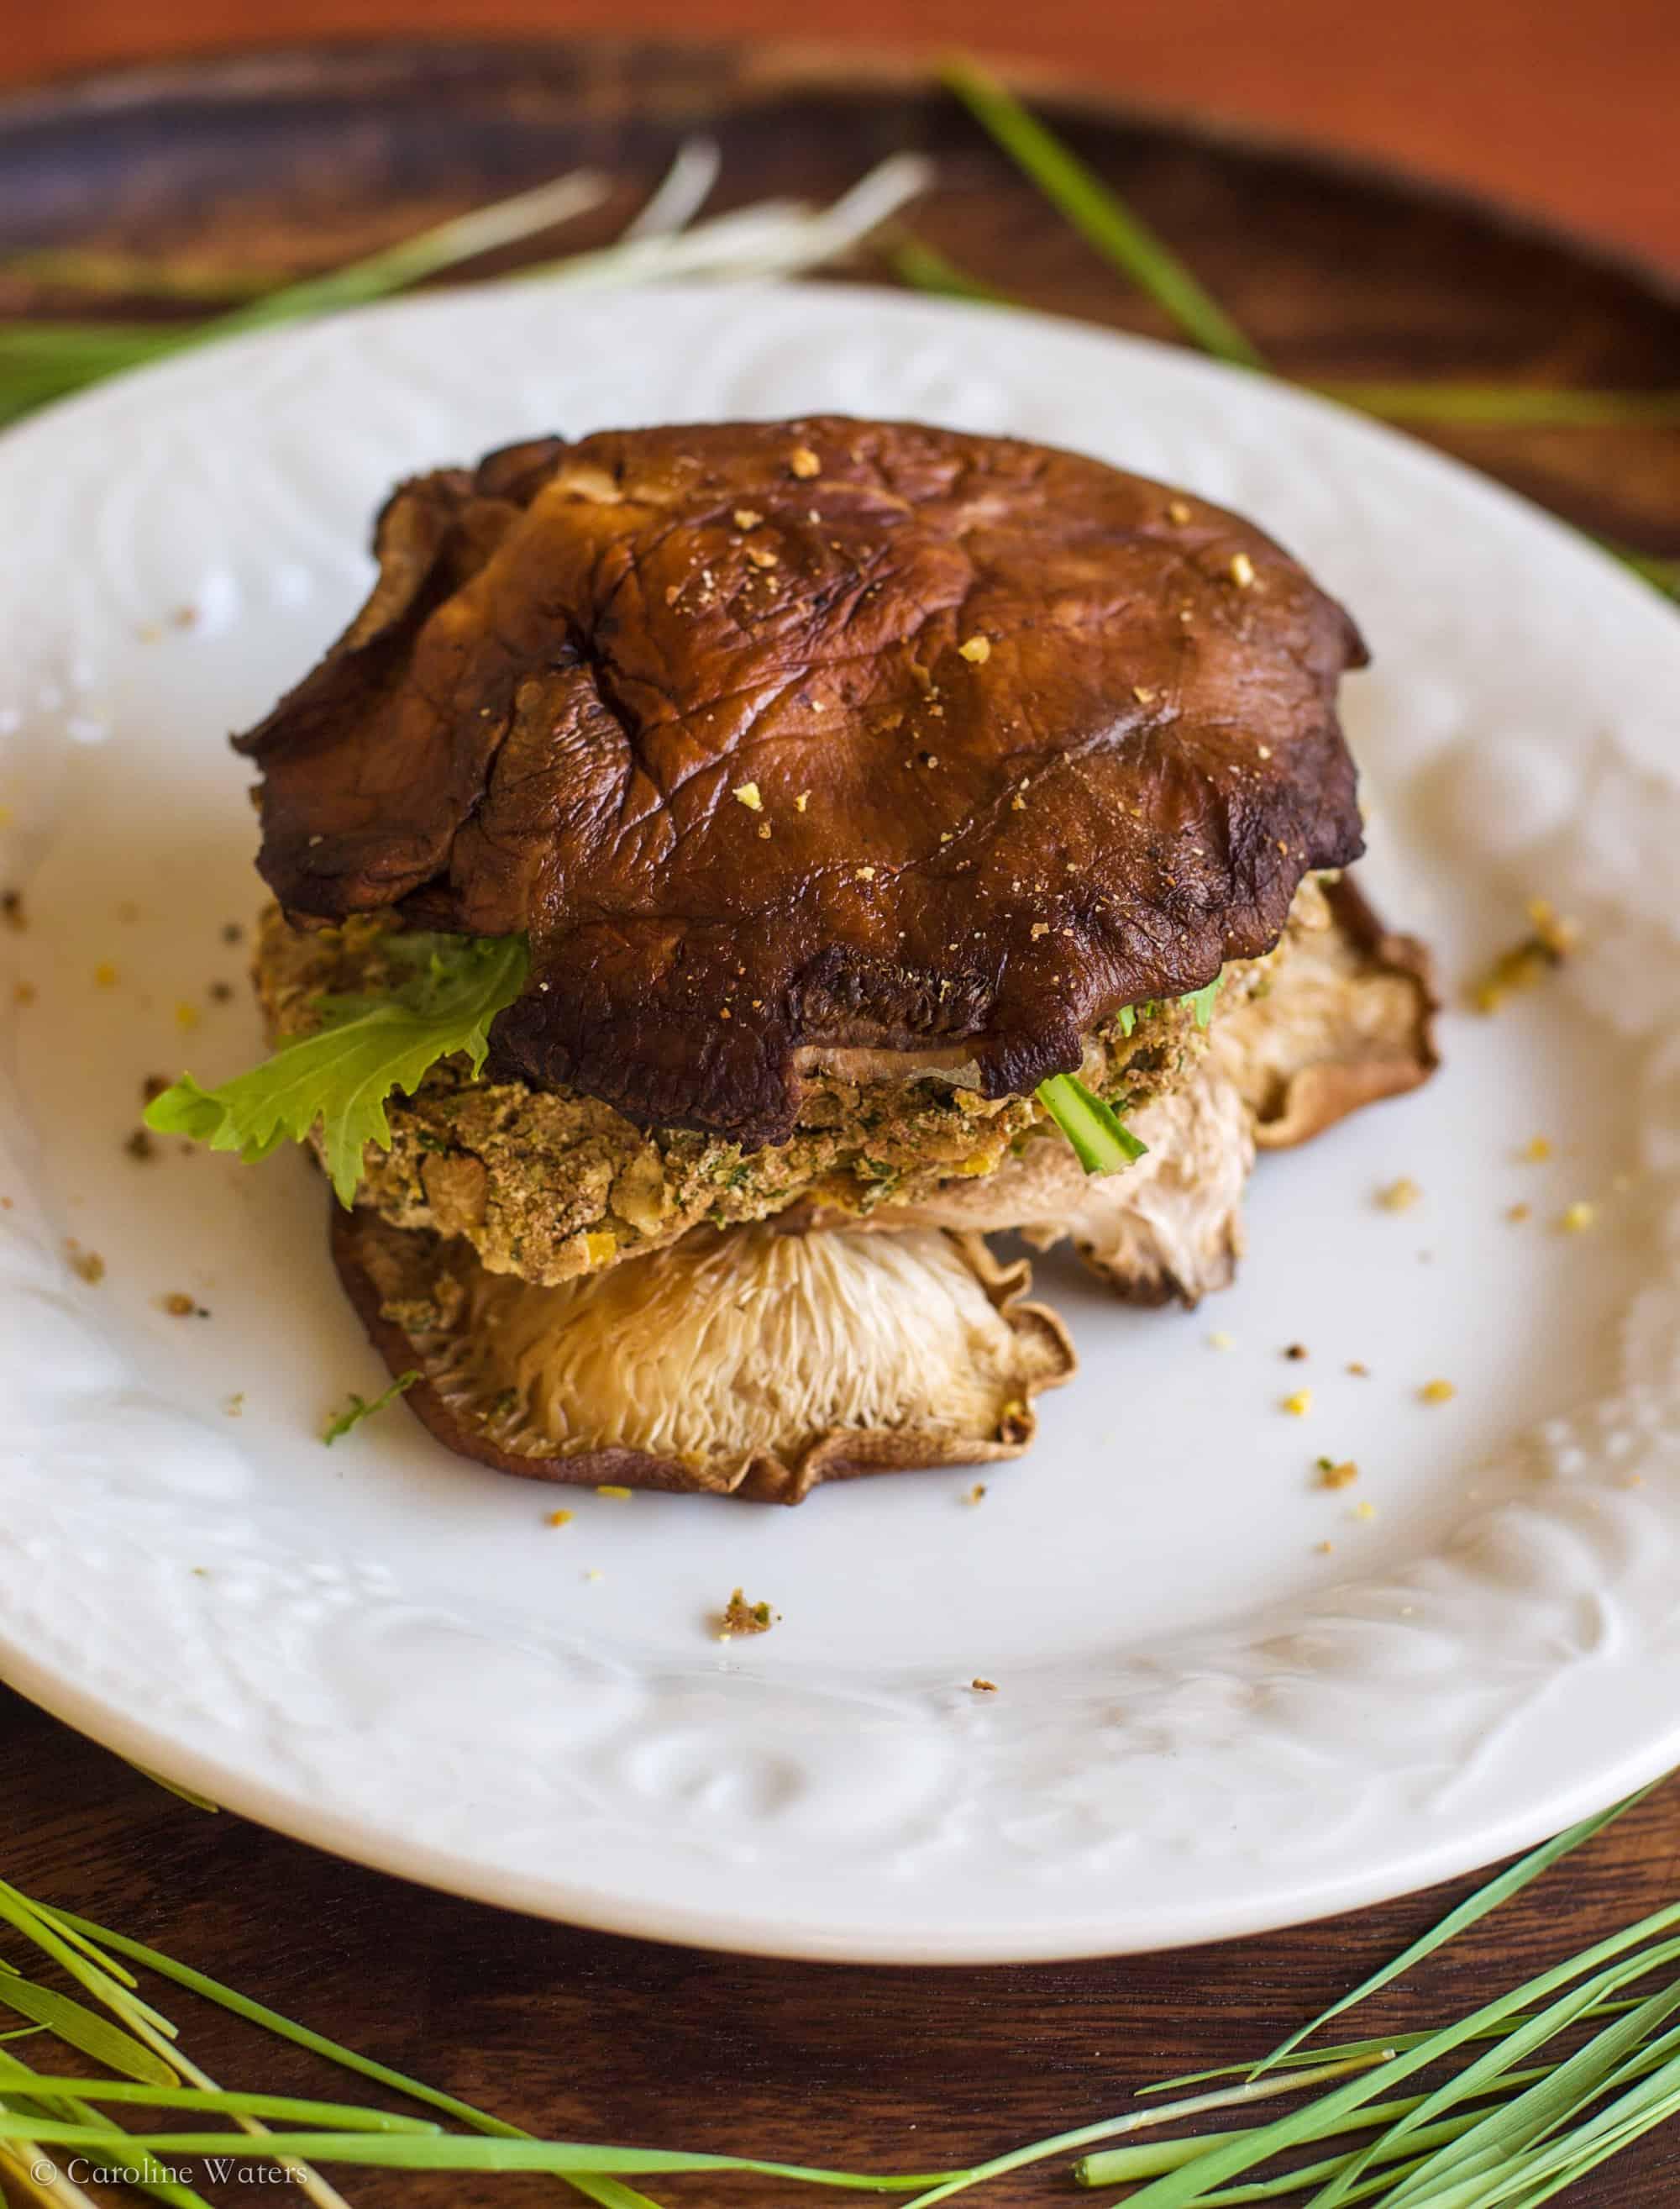 Epic Kale Burgers with Shiitake Mushroom Buns ♡ (veg)